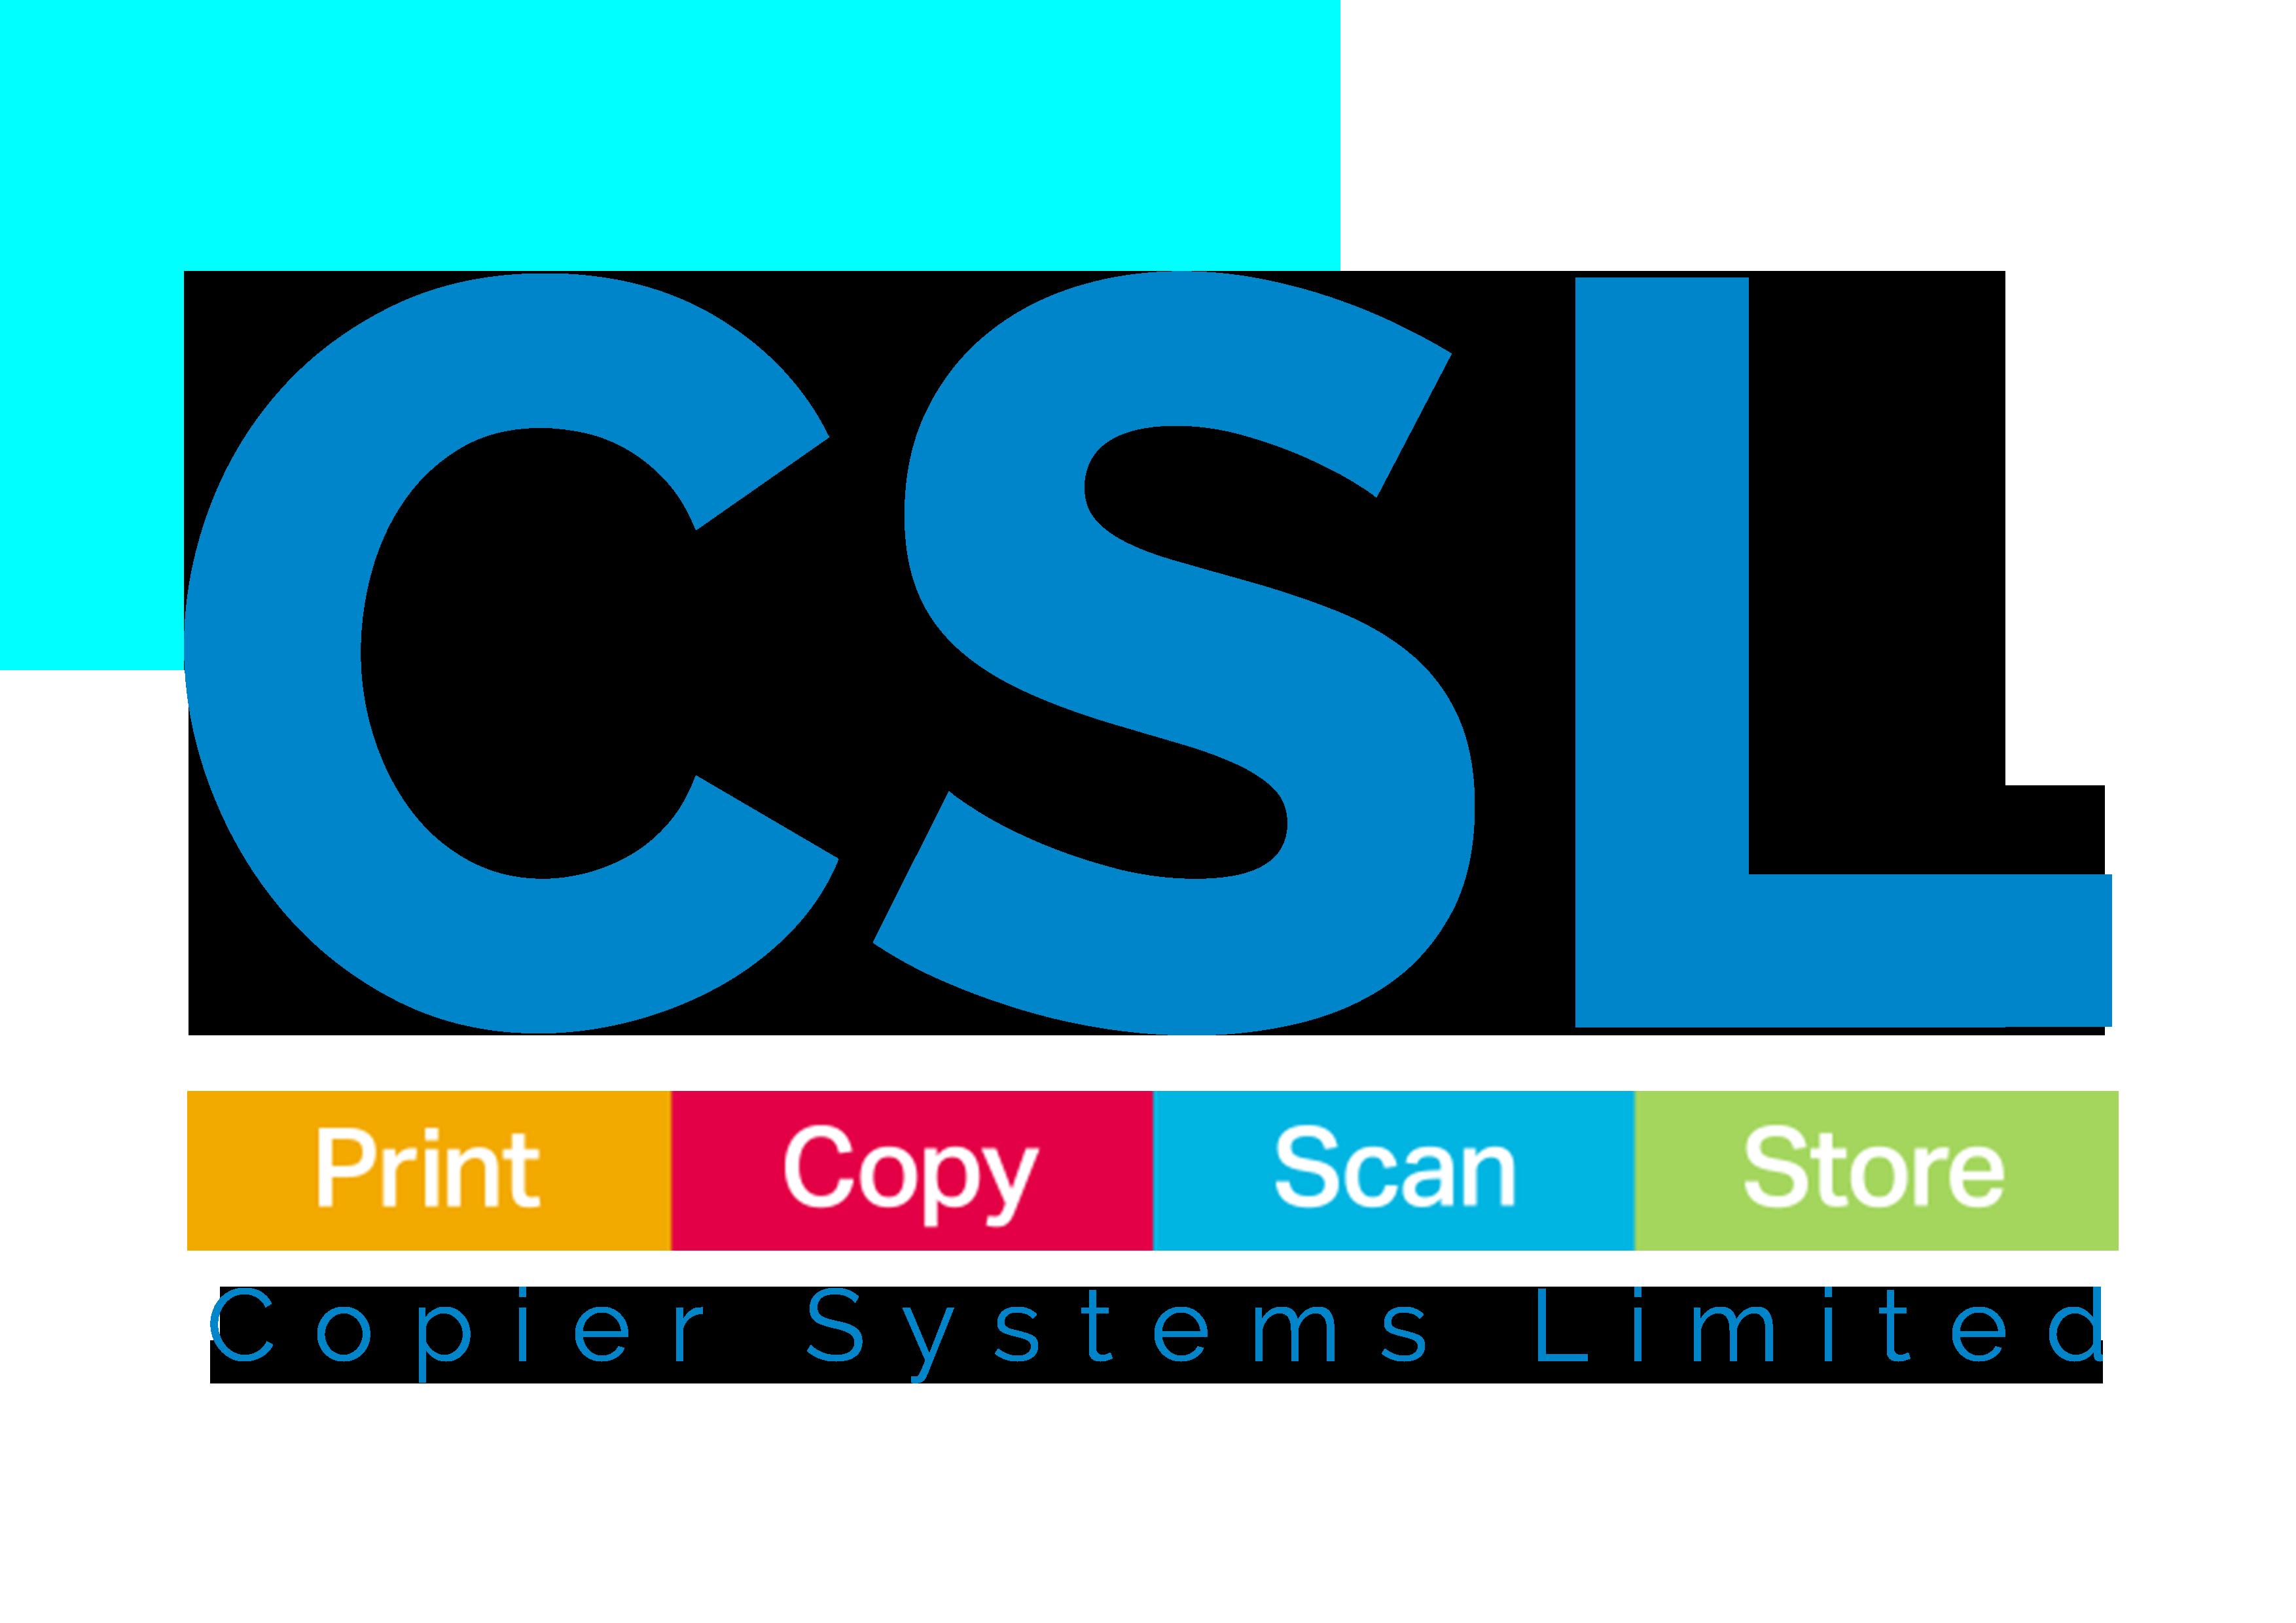 Copier Systems